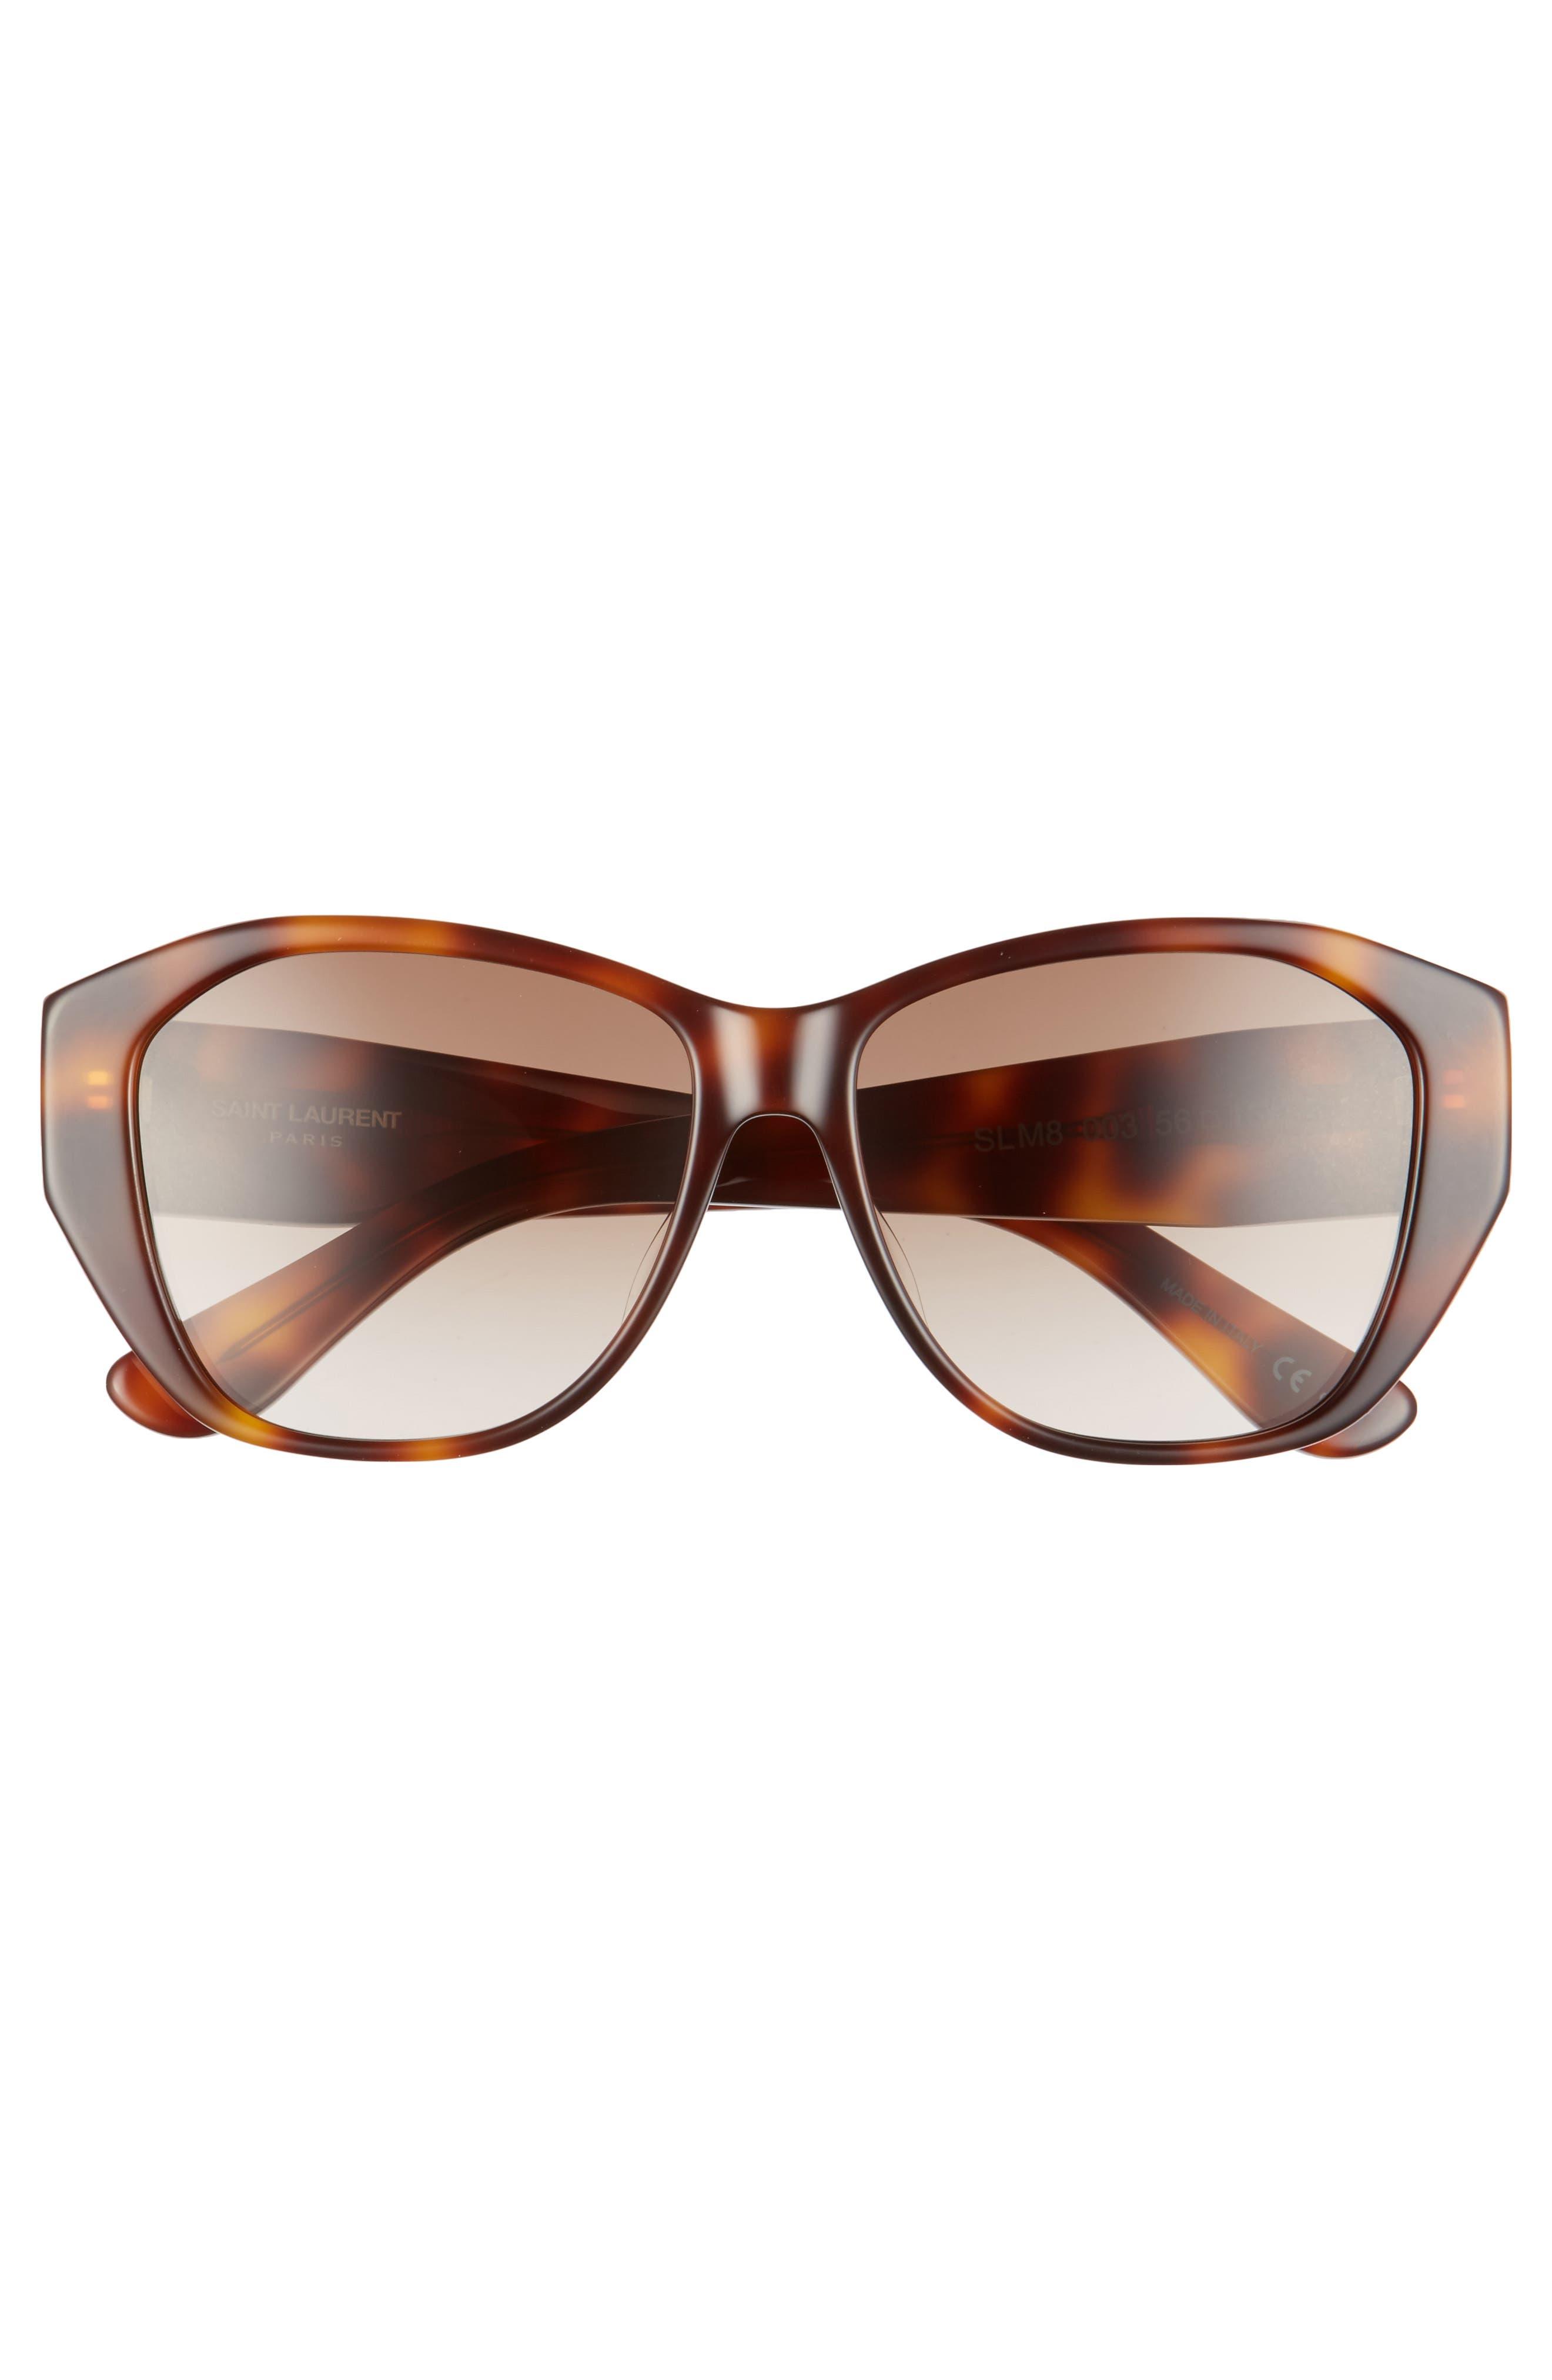 56mm Sunglasses,                             Alternate thumbnail 3, color,                             Havana/ Havana/ Brown